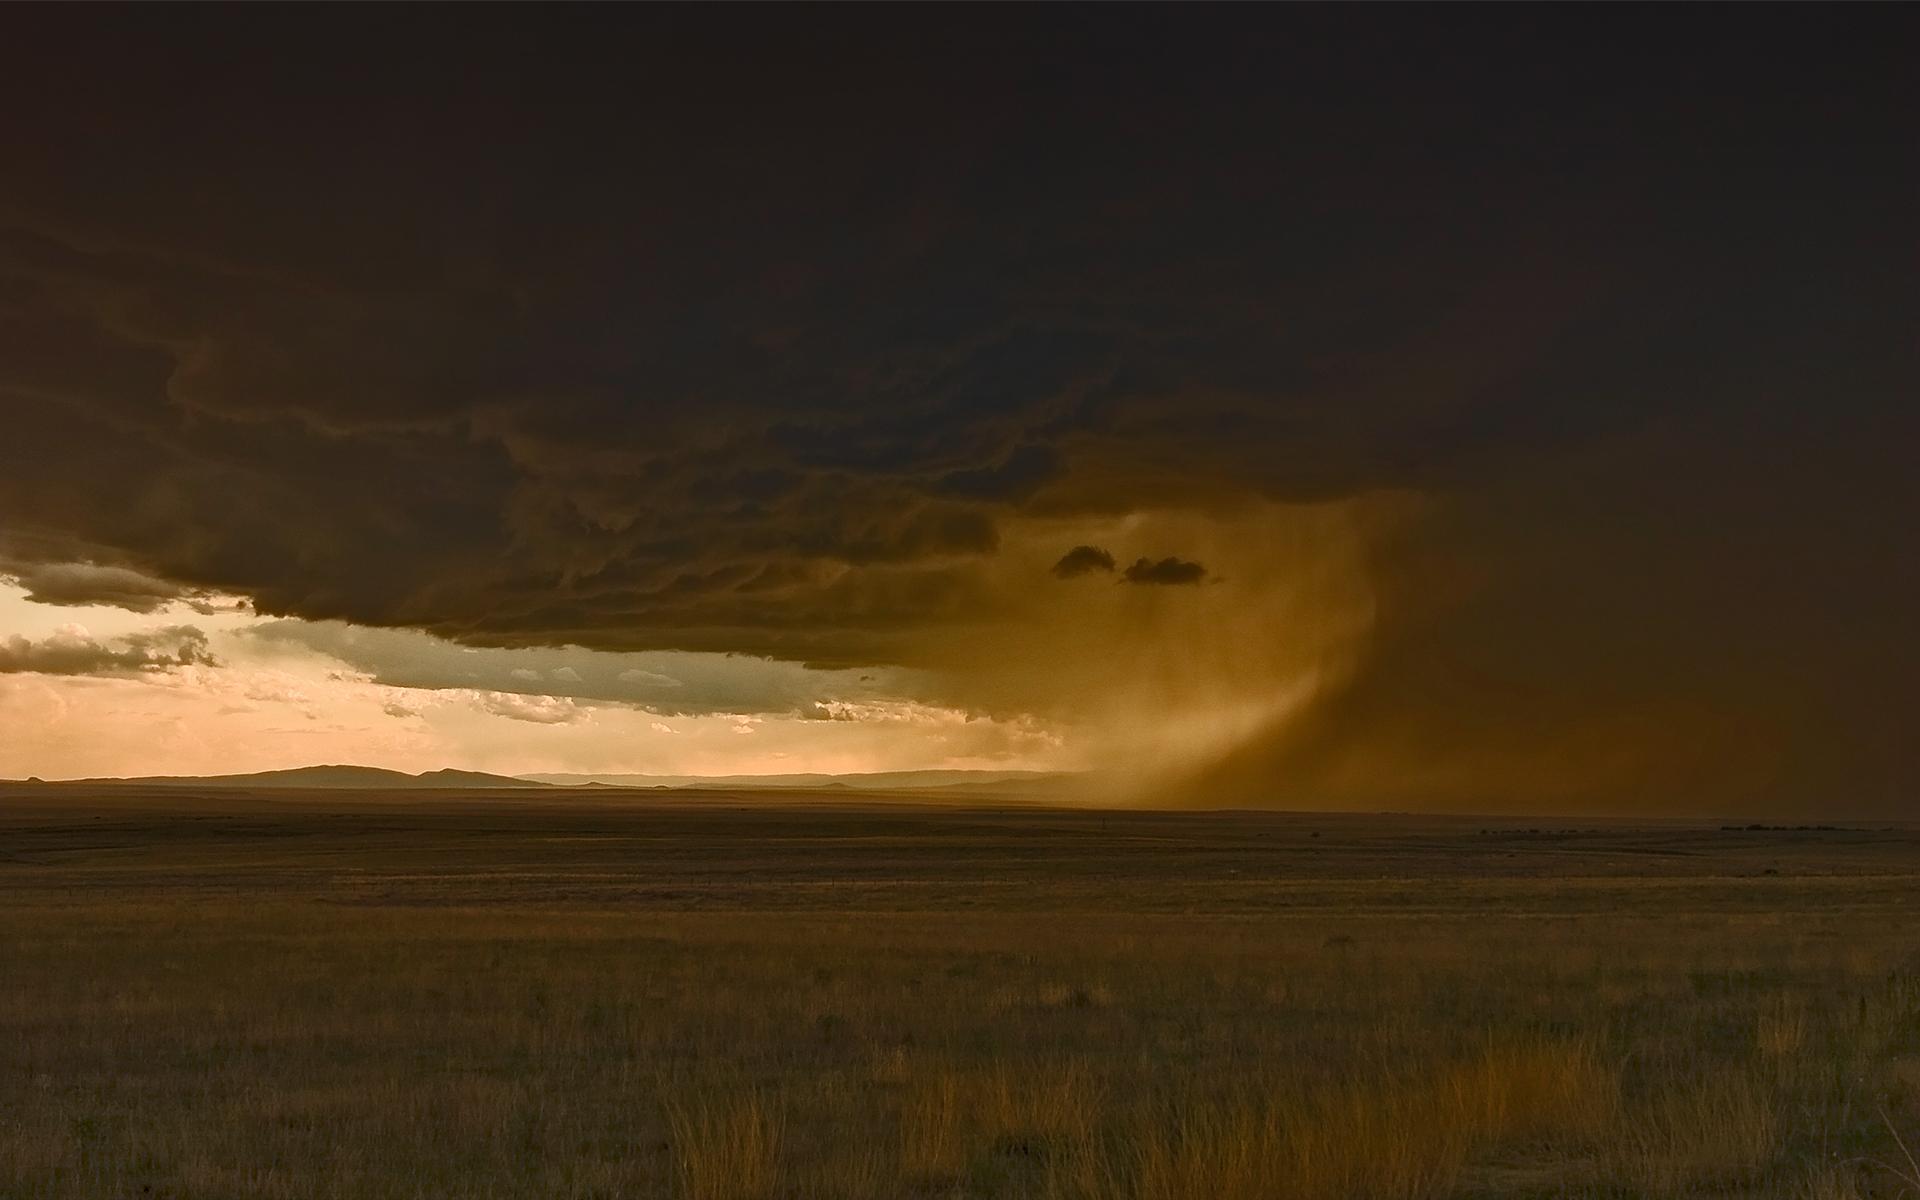 Storm on Southwest Plains III by elektronika7